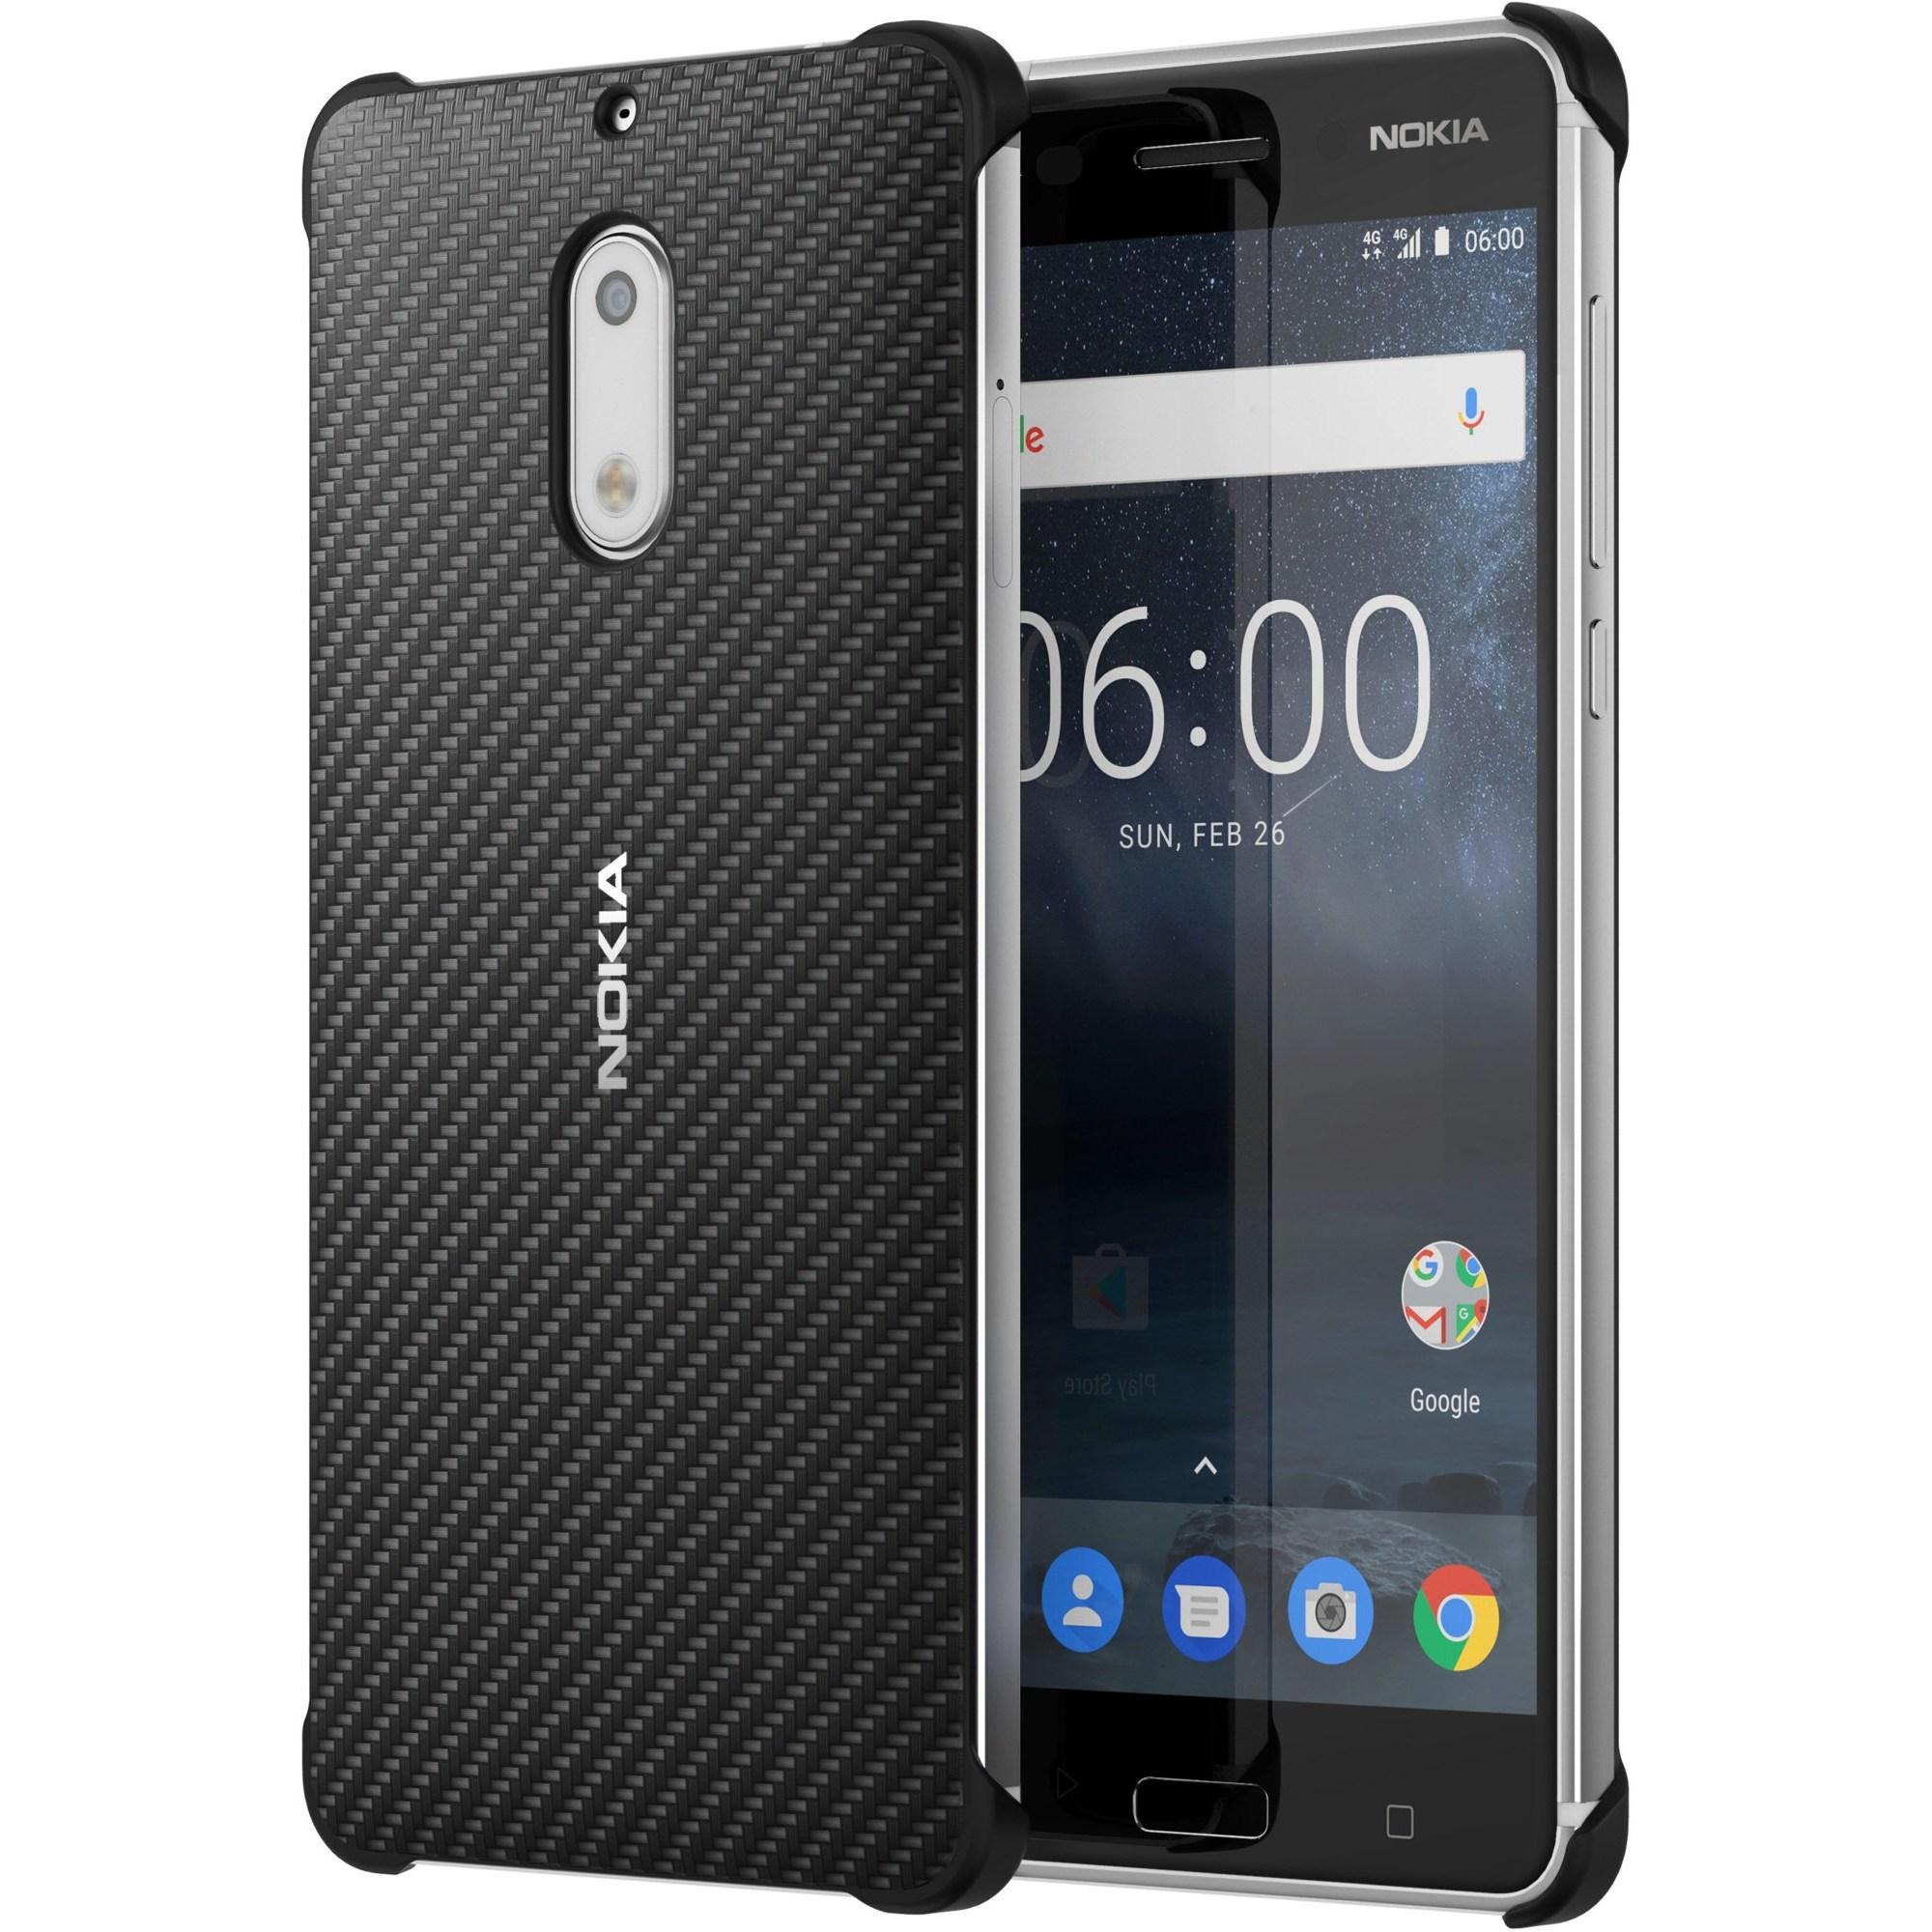 Capac protectie Carbon Fibre Design Nokia CC-802 pentru Nokia 6 Black